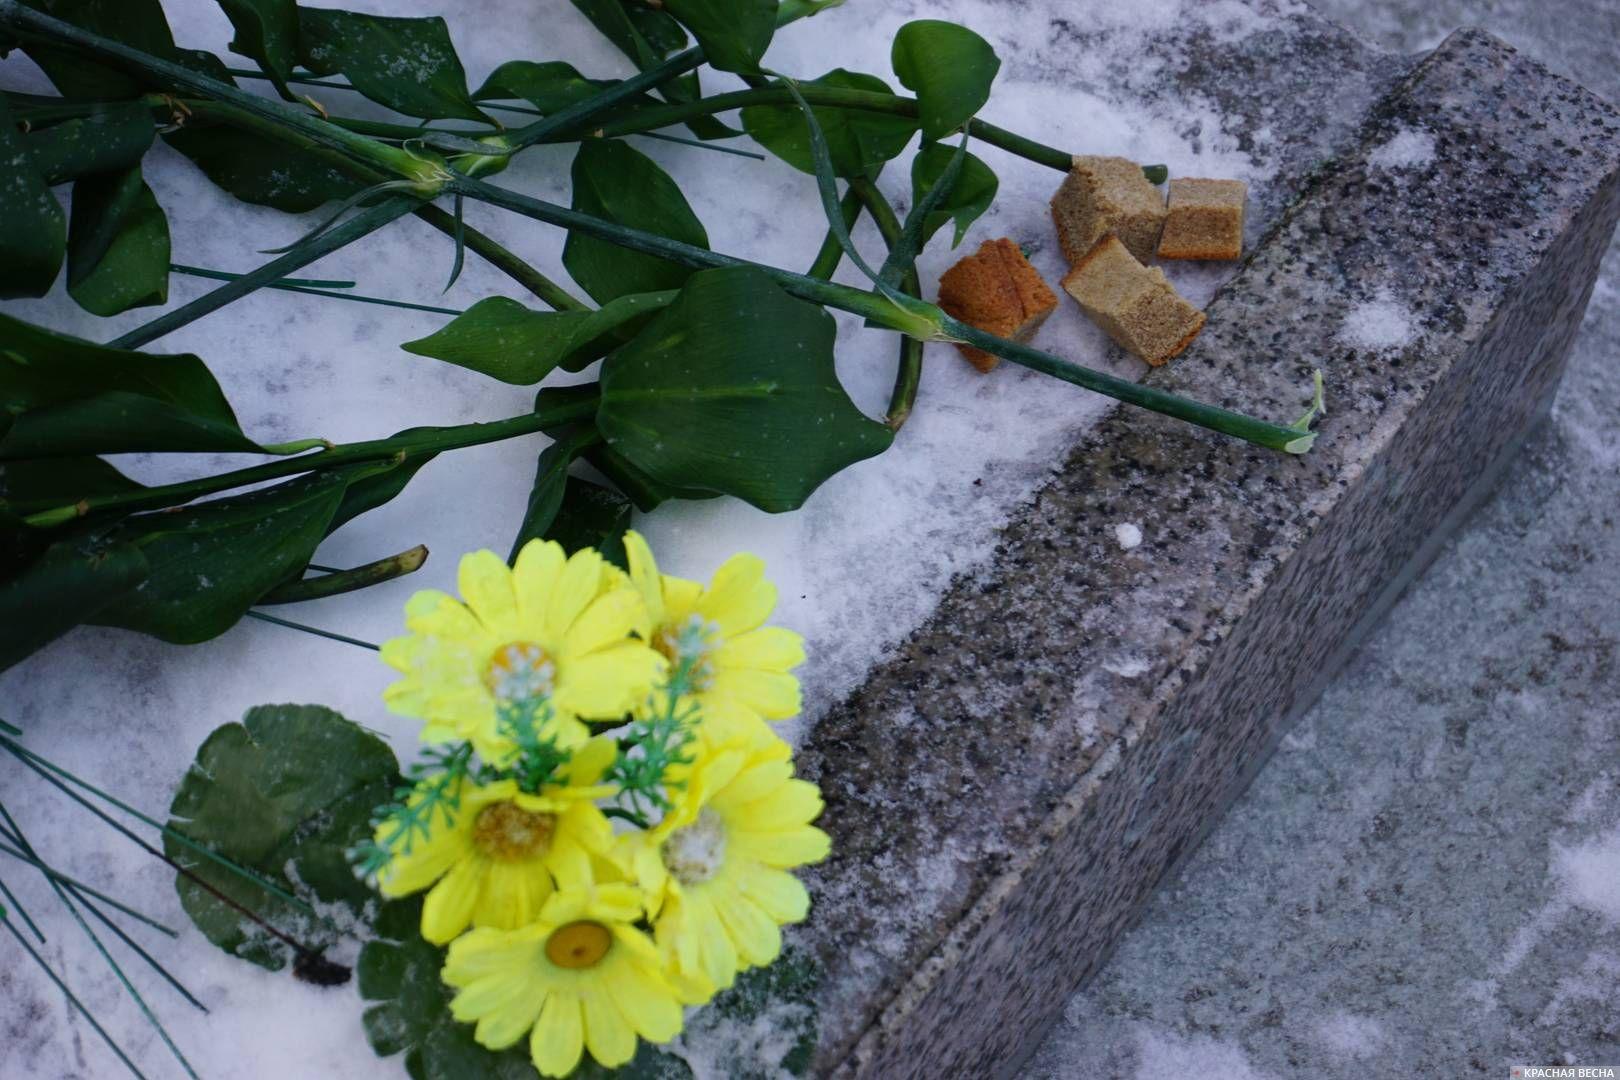 Кусочки хлеба на могиле павших защитников Ленинграда. 27.01.2019